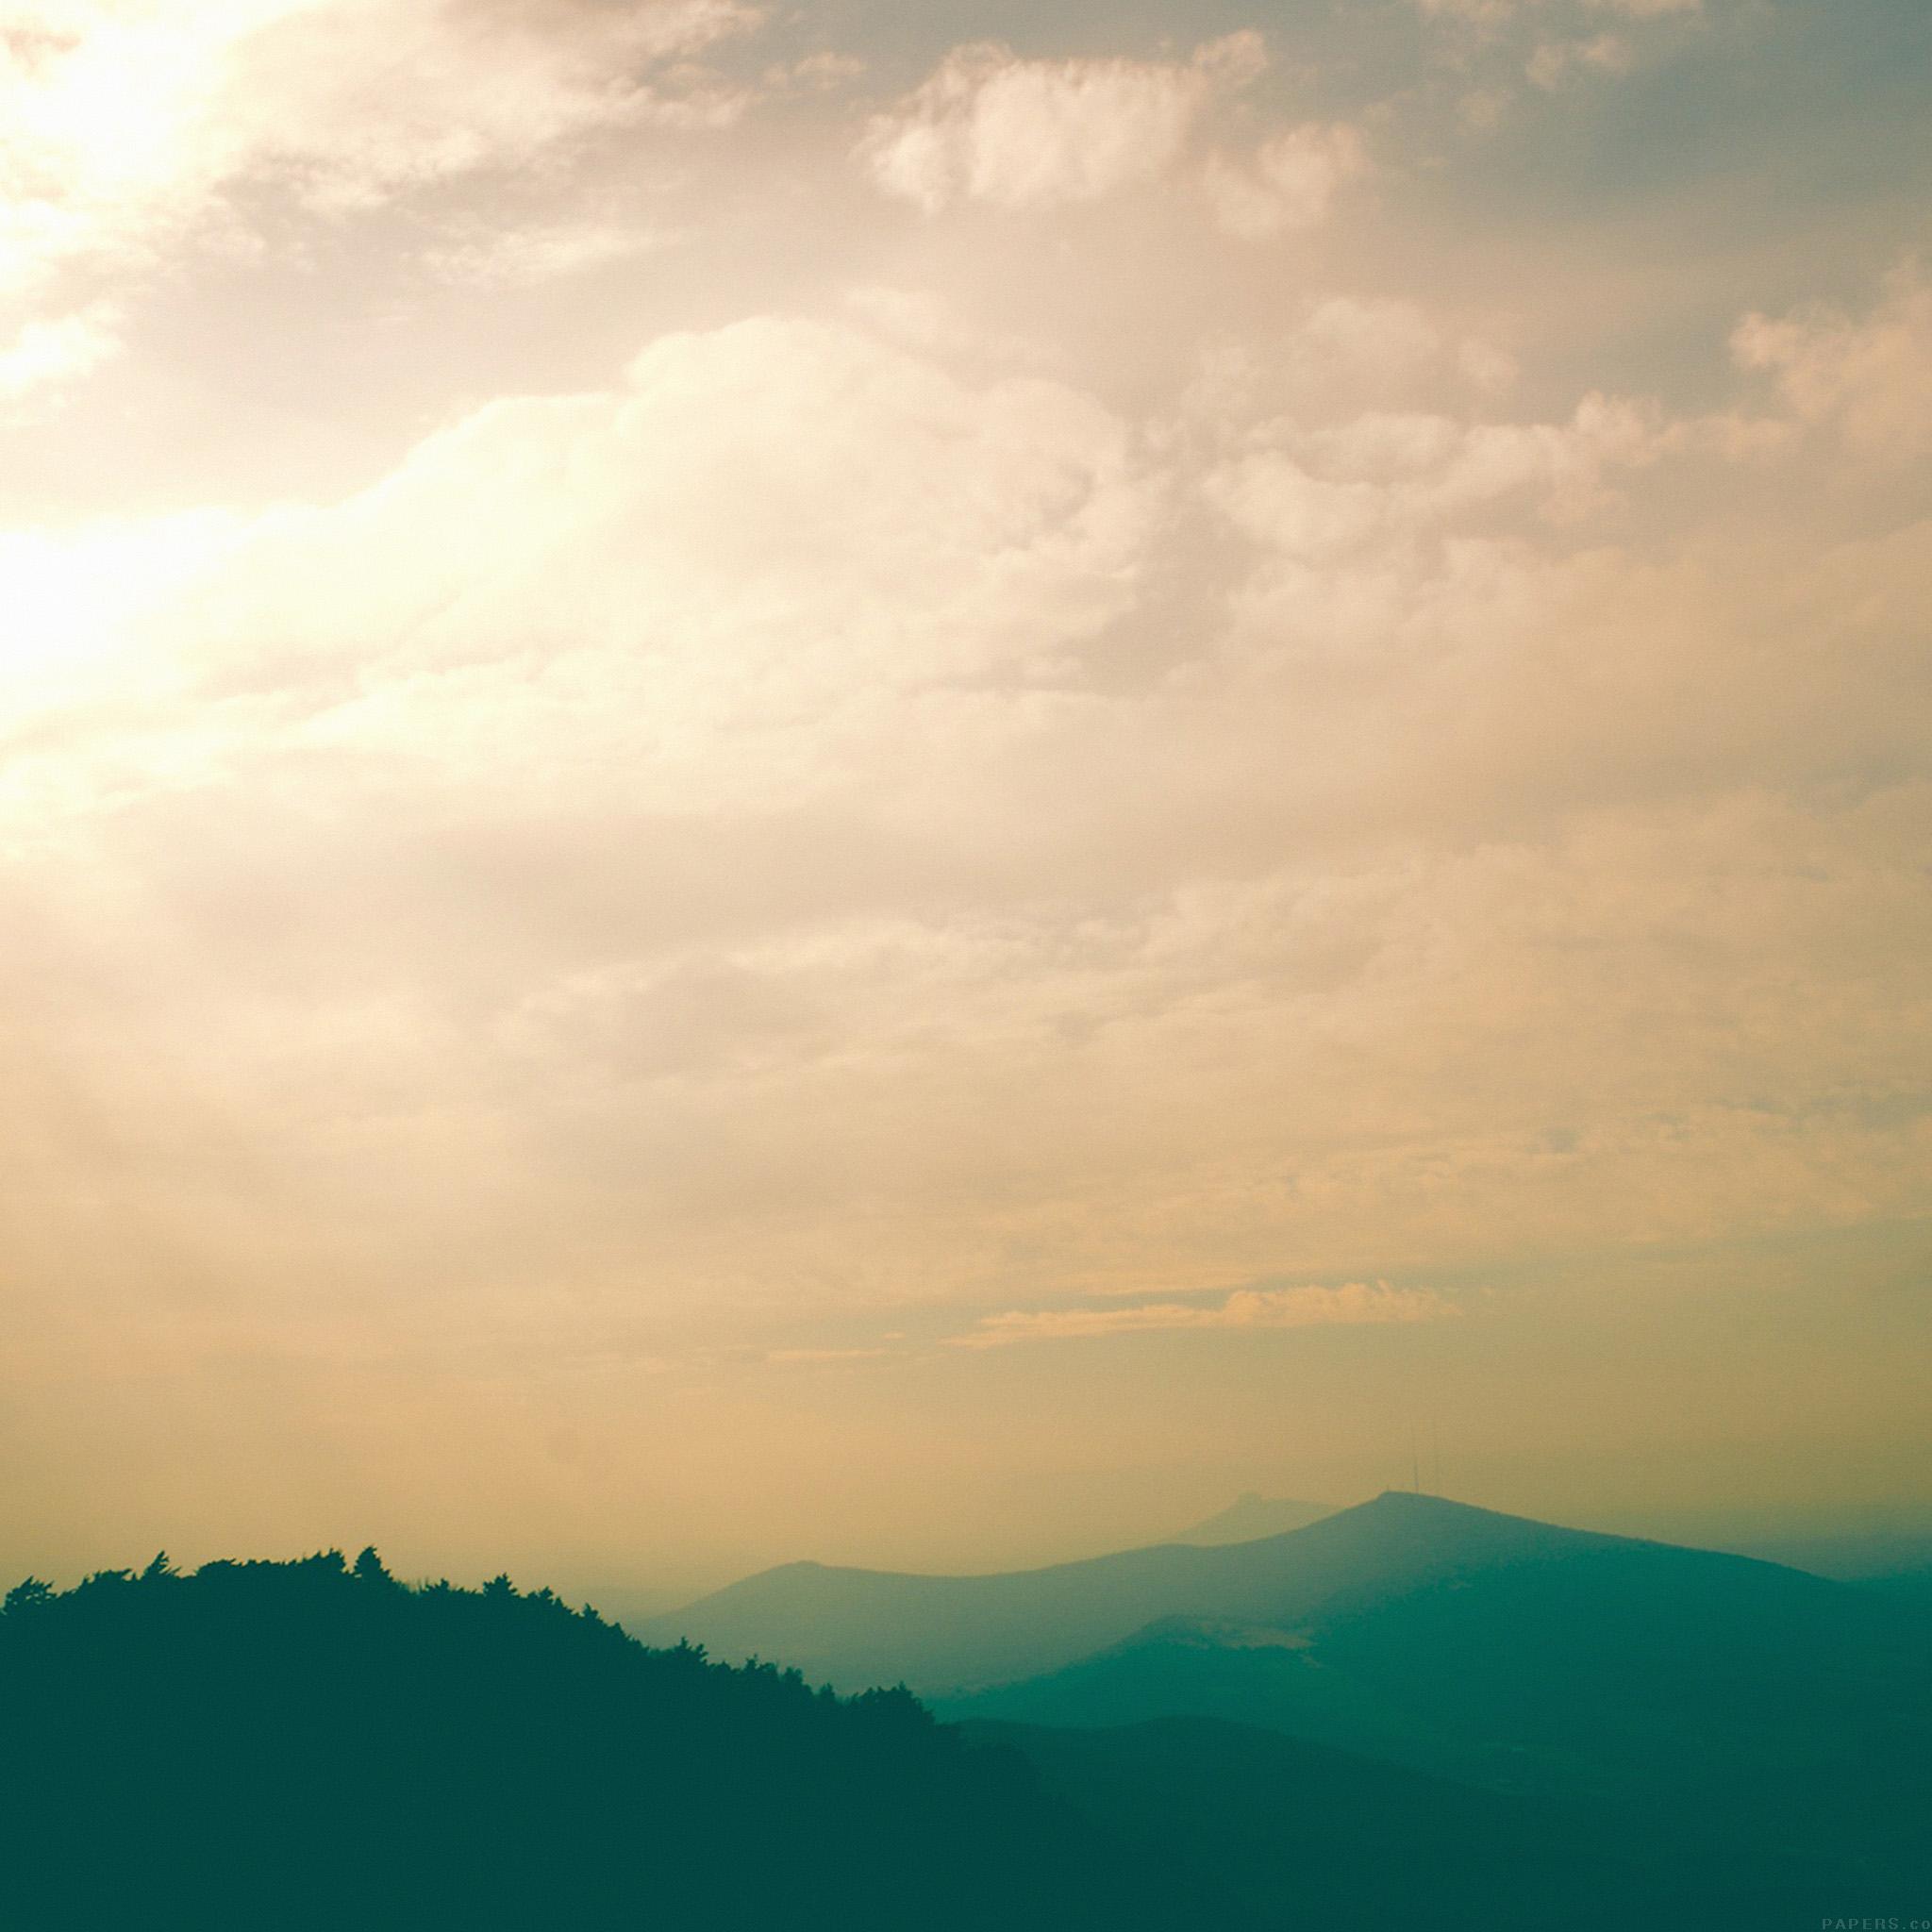 Cloud Wallpaper Hd: Mq91-the-end-sunrise-sky-cloud-shine-nature